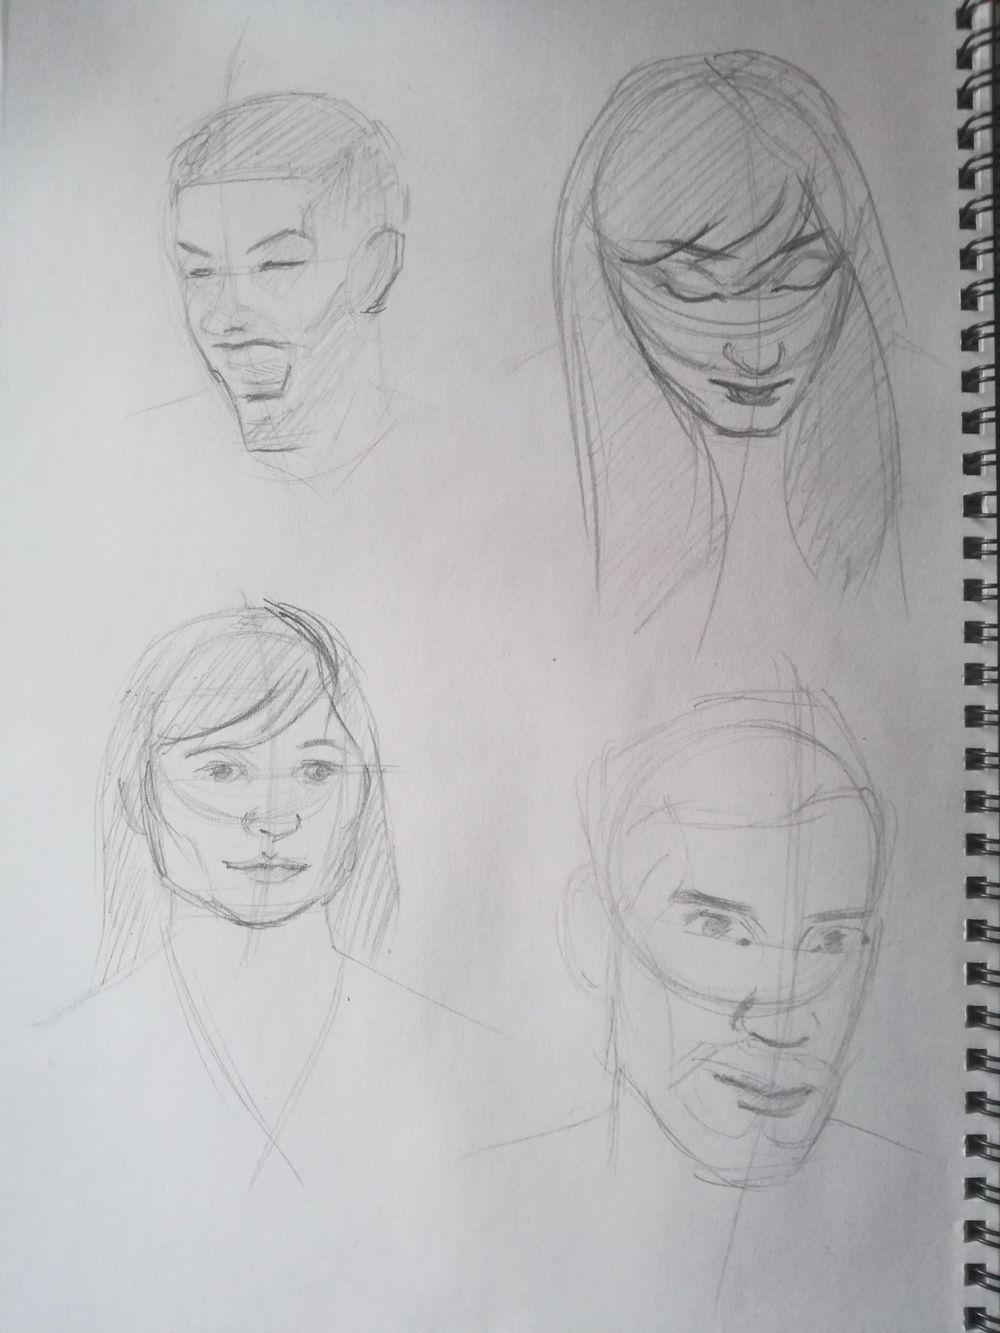 Portraits - image 15 - student project